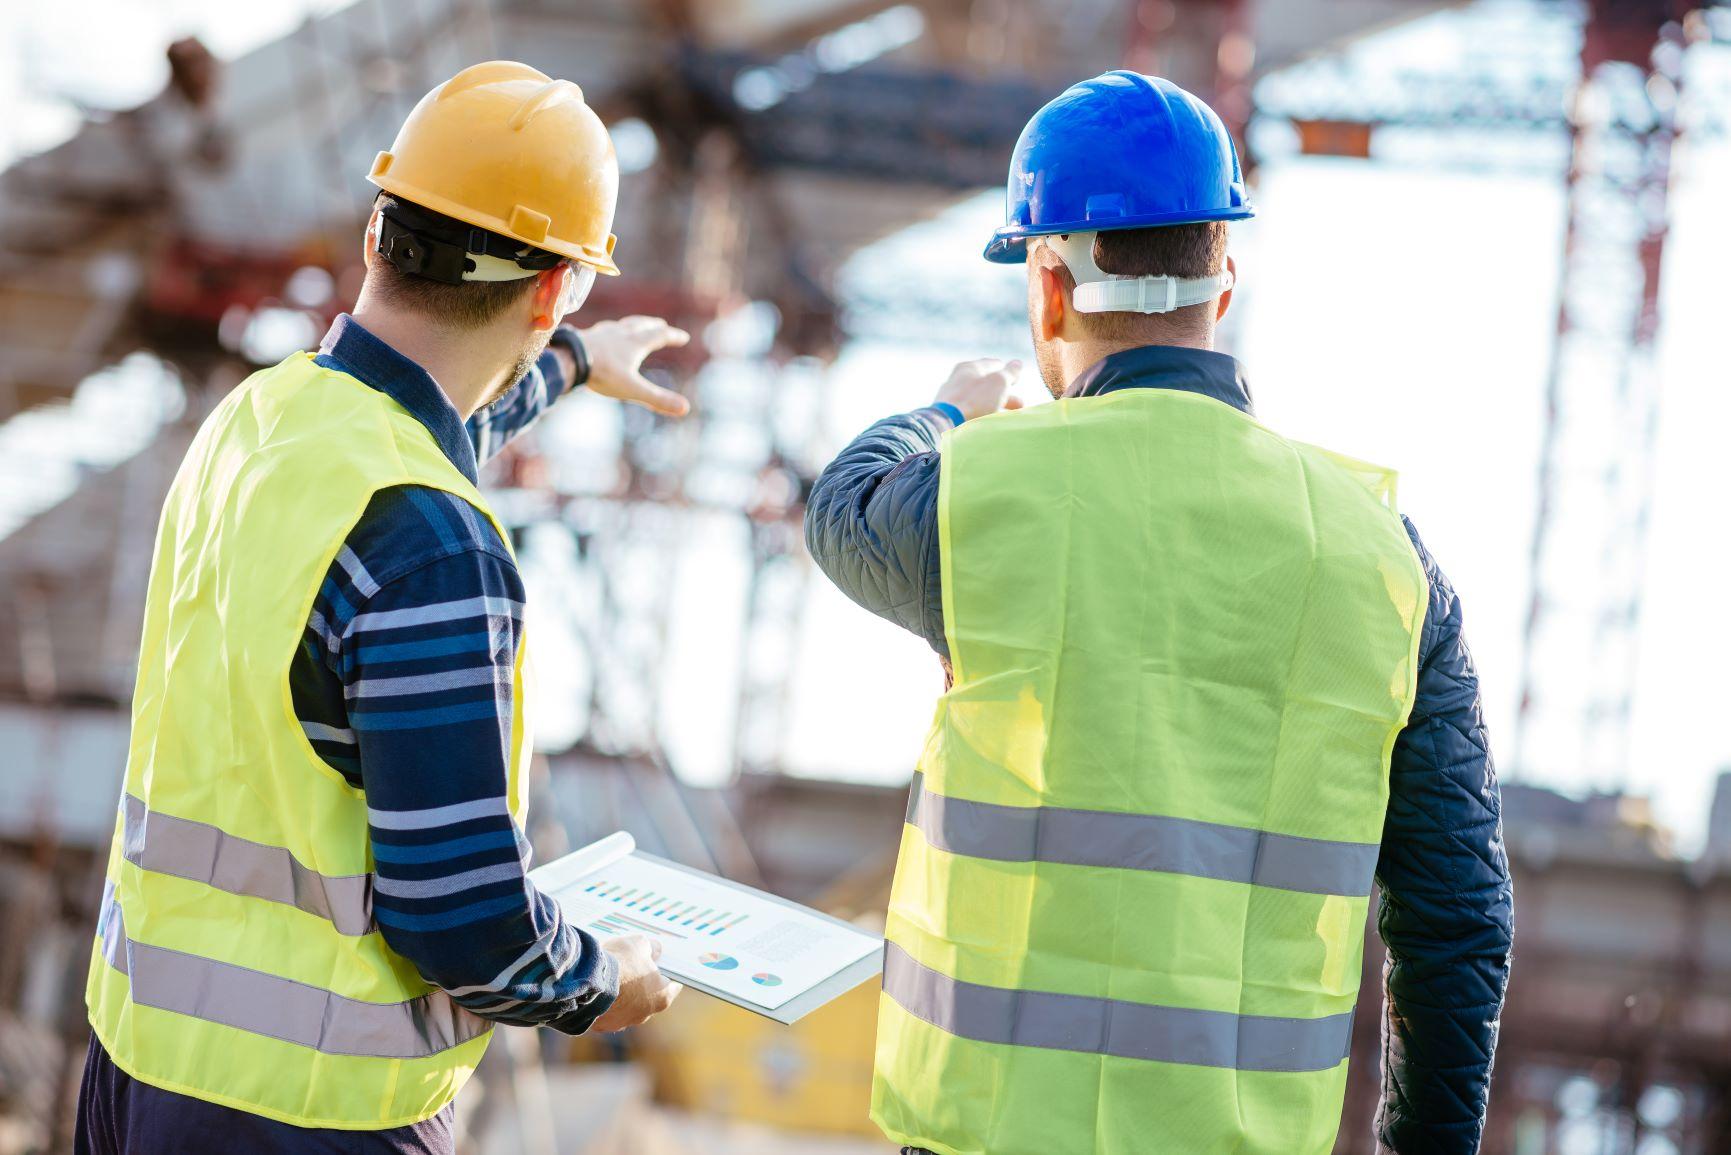 Engineering professional insurance